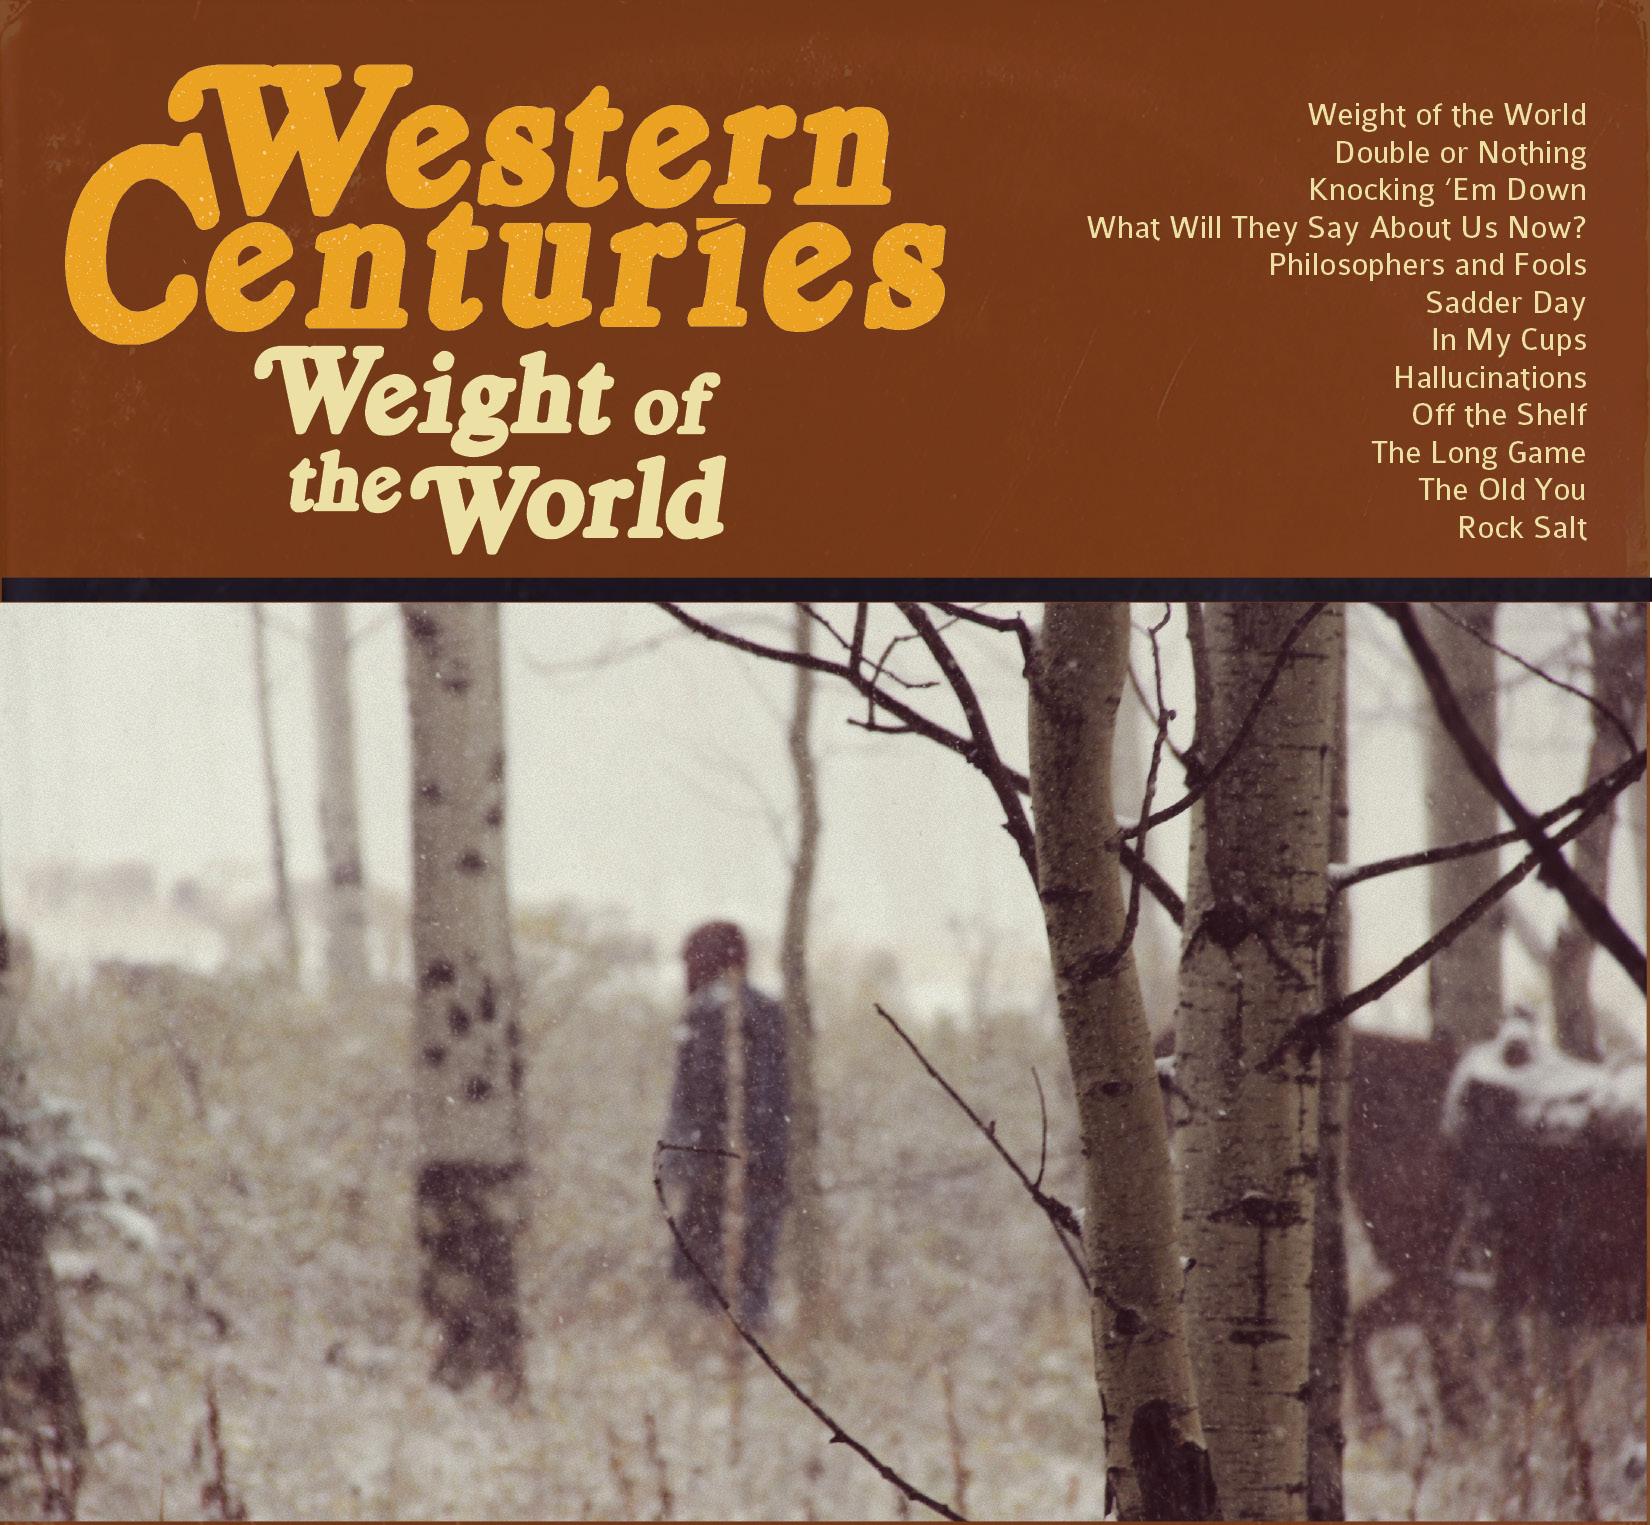 WC CD COVER.jpg